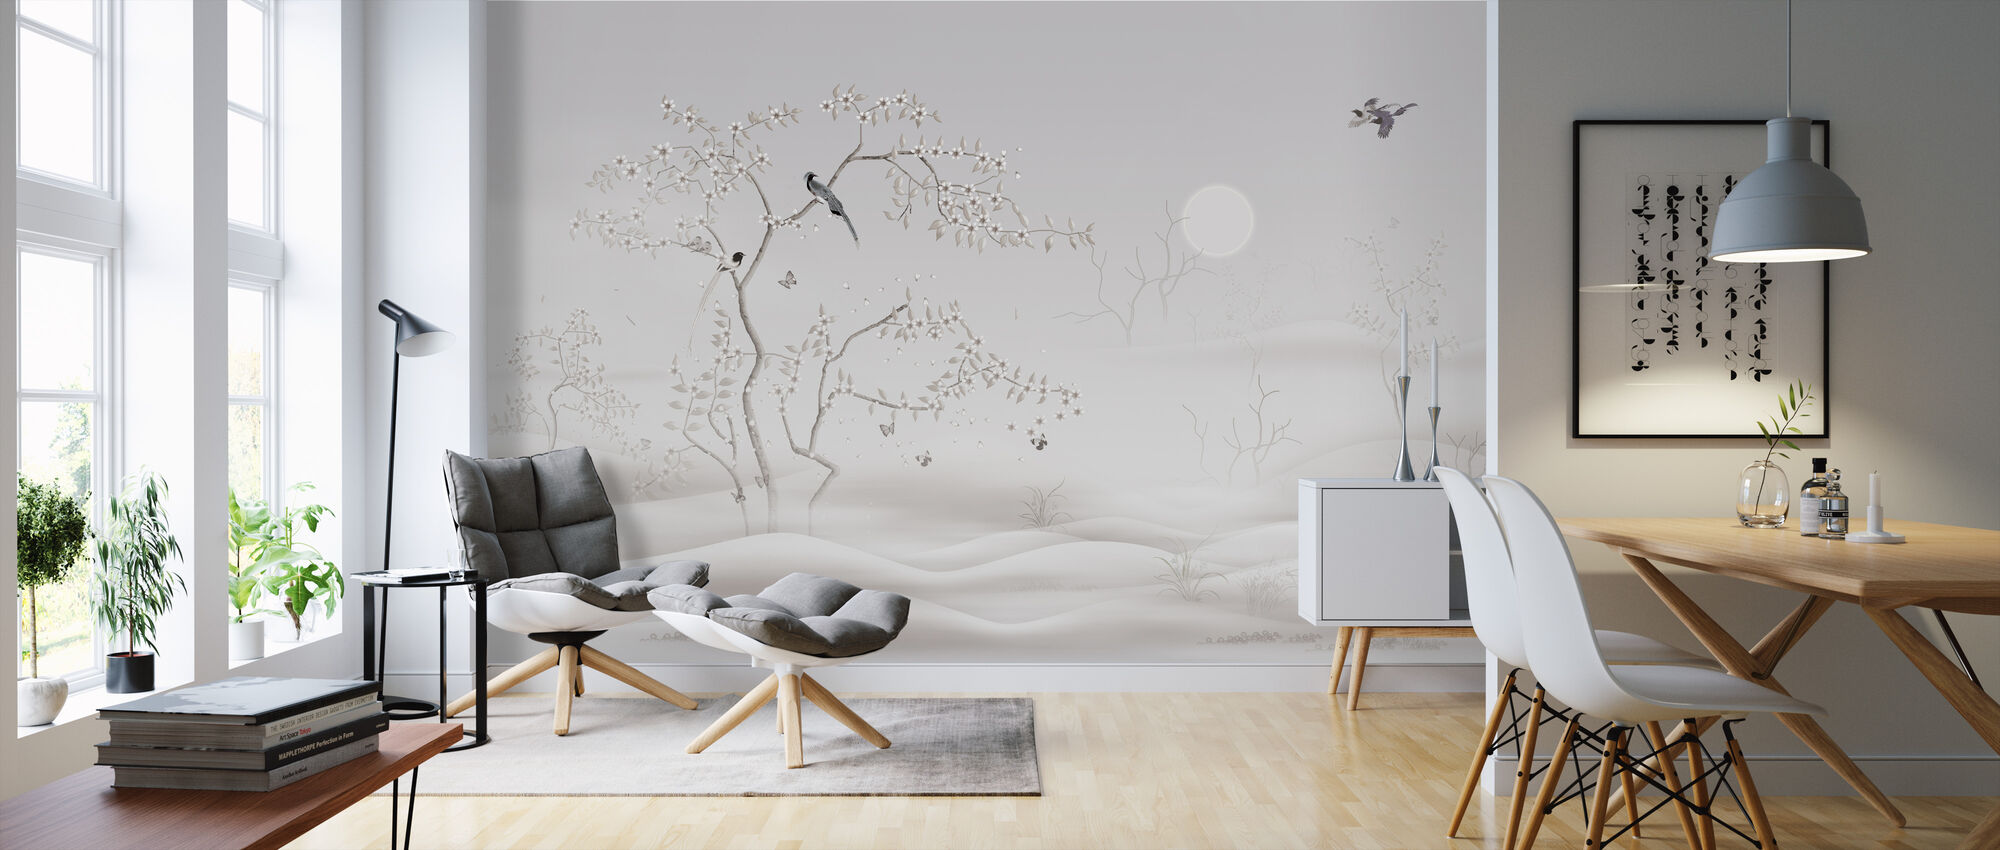 Thesaurus Sunset - Wallpaper - Living Room